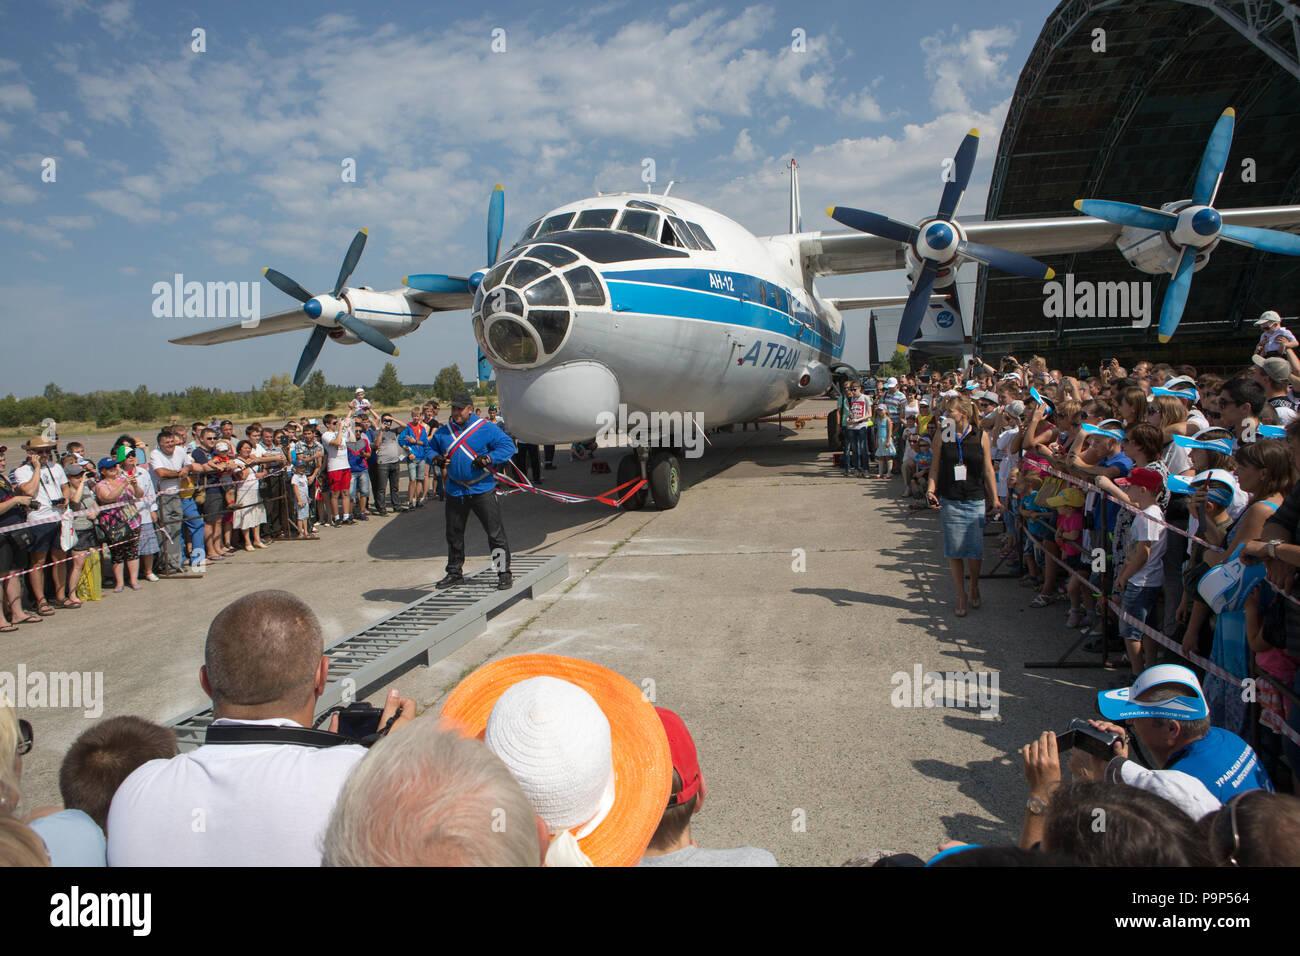 Vyacheslav Maksyuta, a Russian powerlifter prepares to move 50-tonnes heavy Antonov An-12 airplane at the public event near Ulyanovsk, Russia - Stock Image